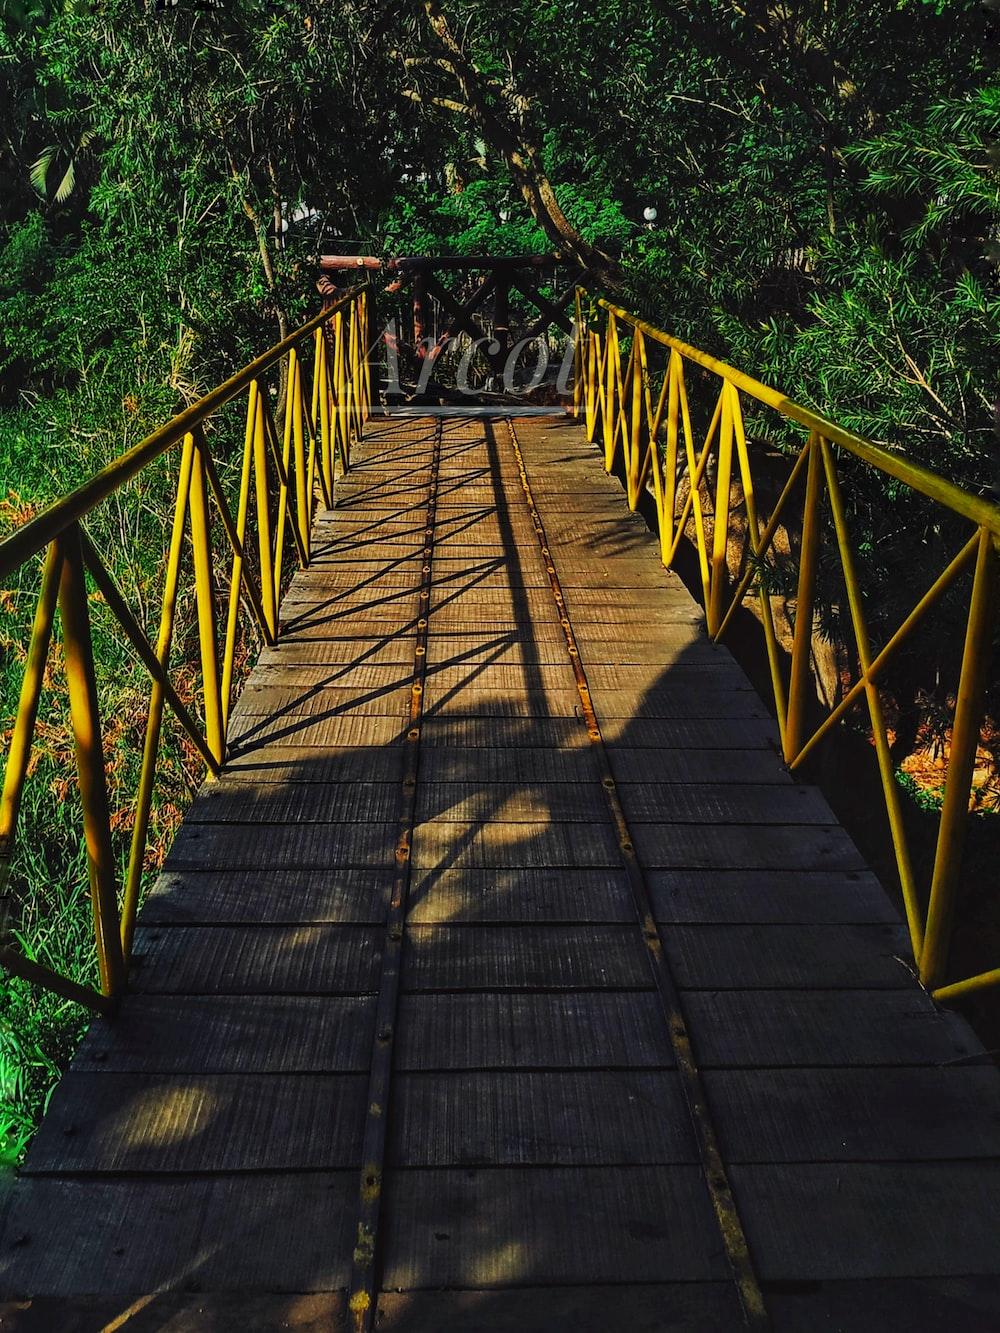 trees beside brown and yellow bridge